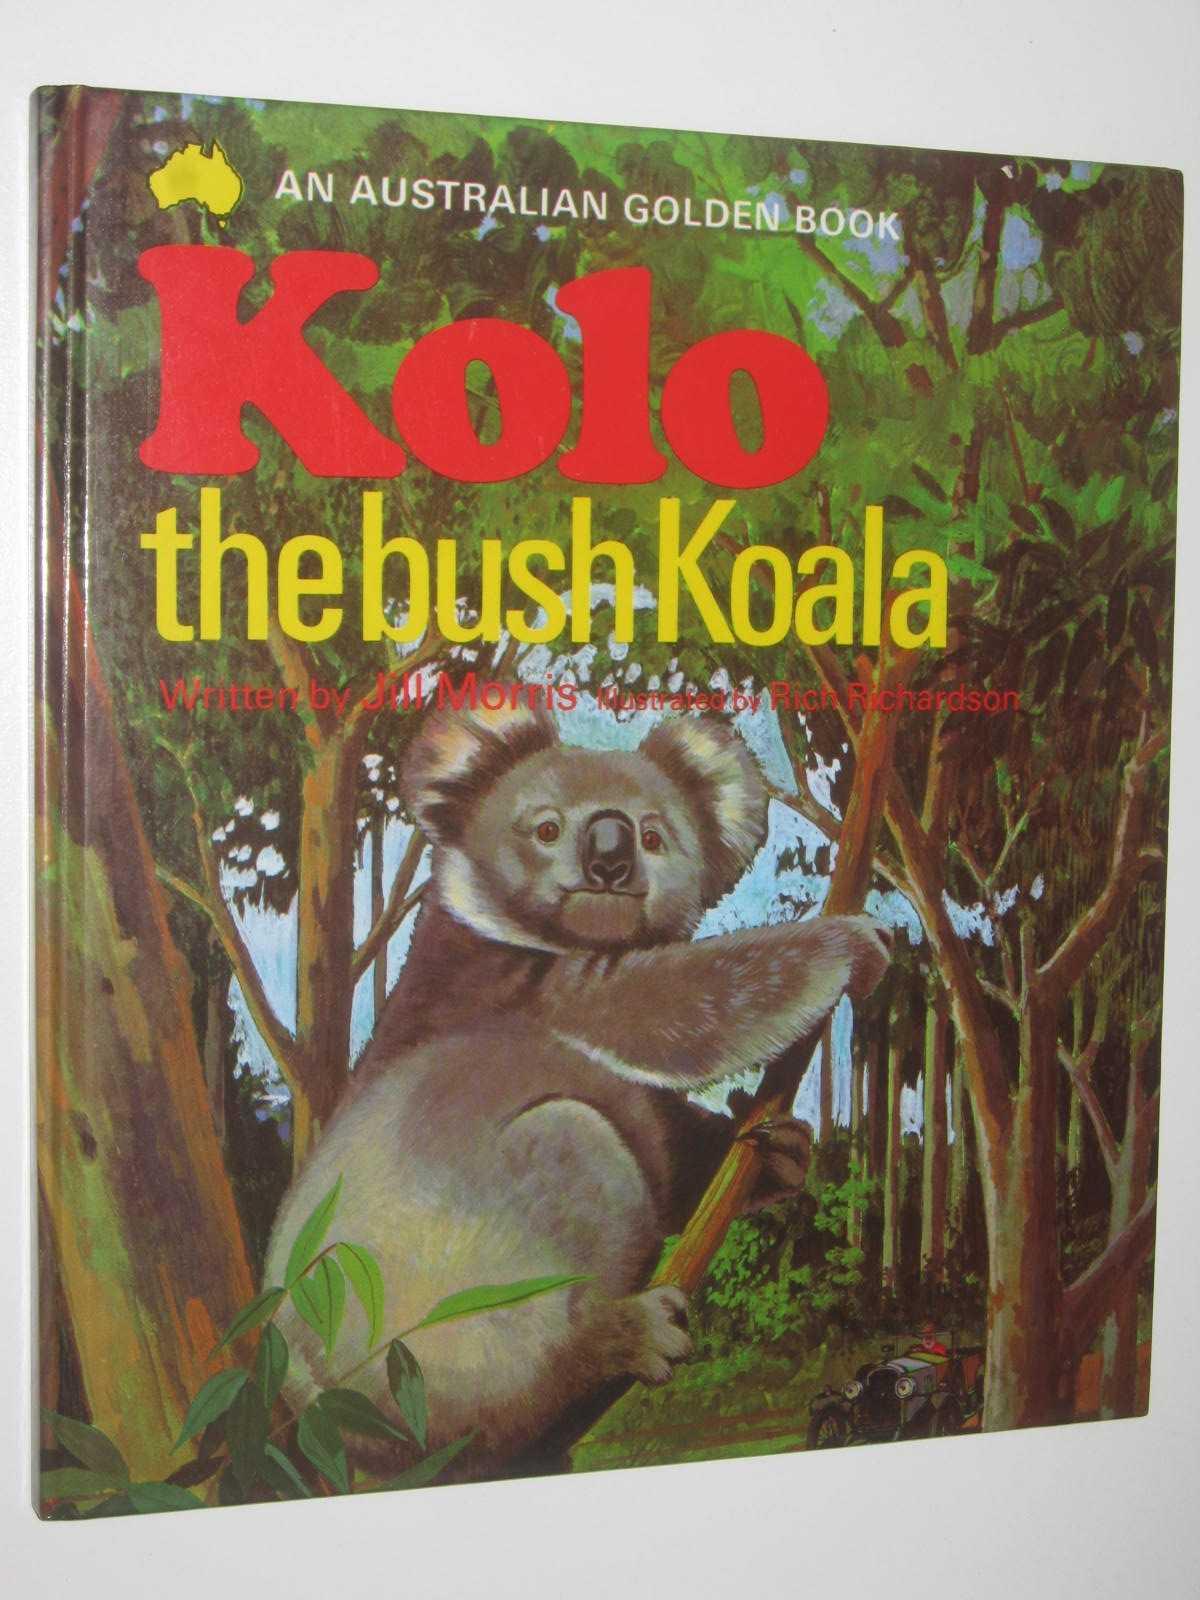 Image for Kolo the Bush Koala - An Australian Golden Book Series